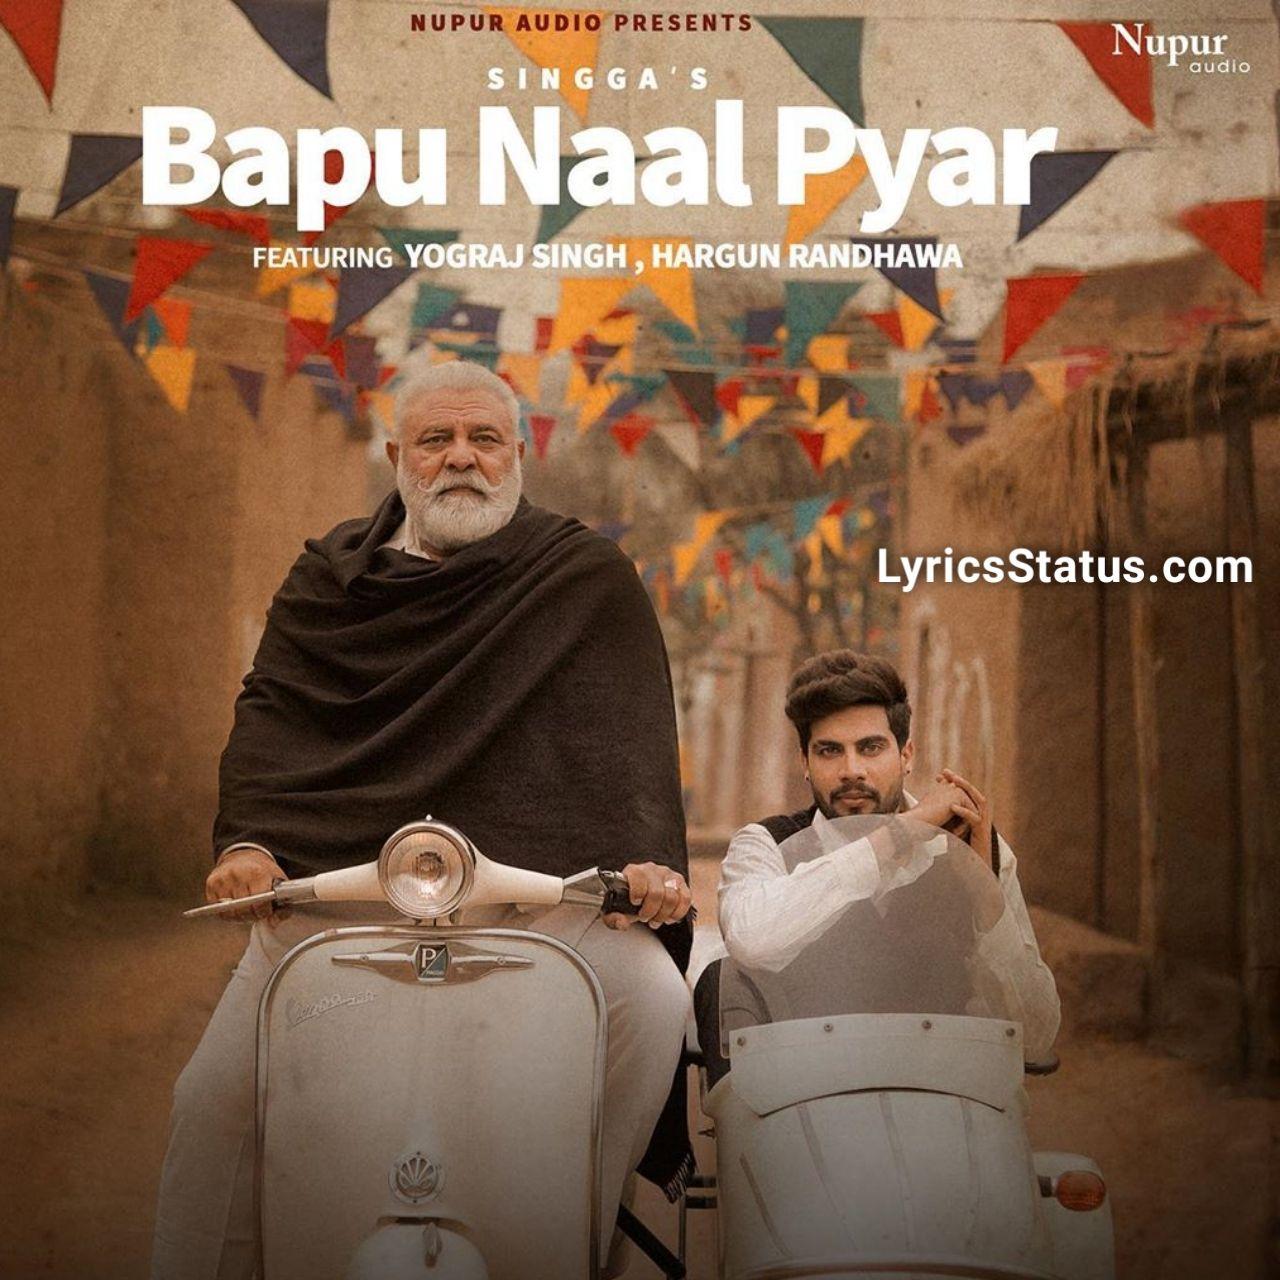 Bapu Naal Pyar Singga Lyrics Status Download Punjabi Song Songs Lyrics Latest Song Lyrics